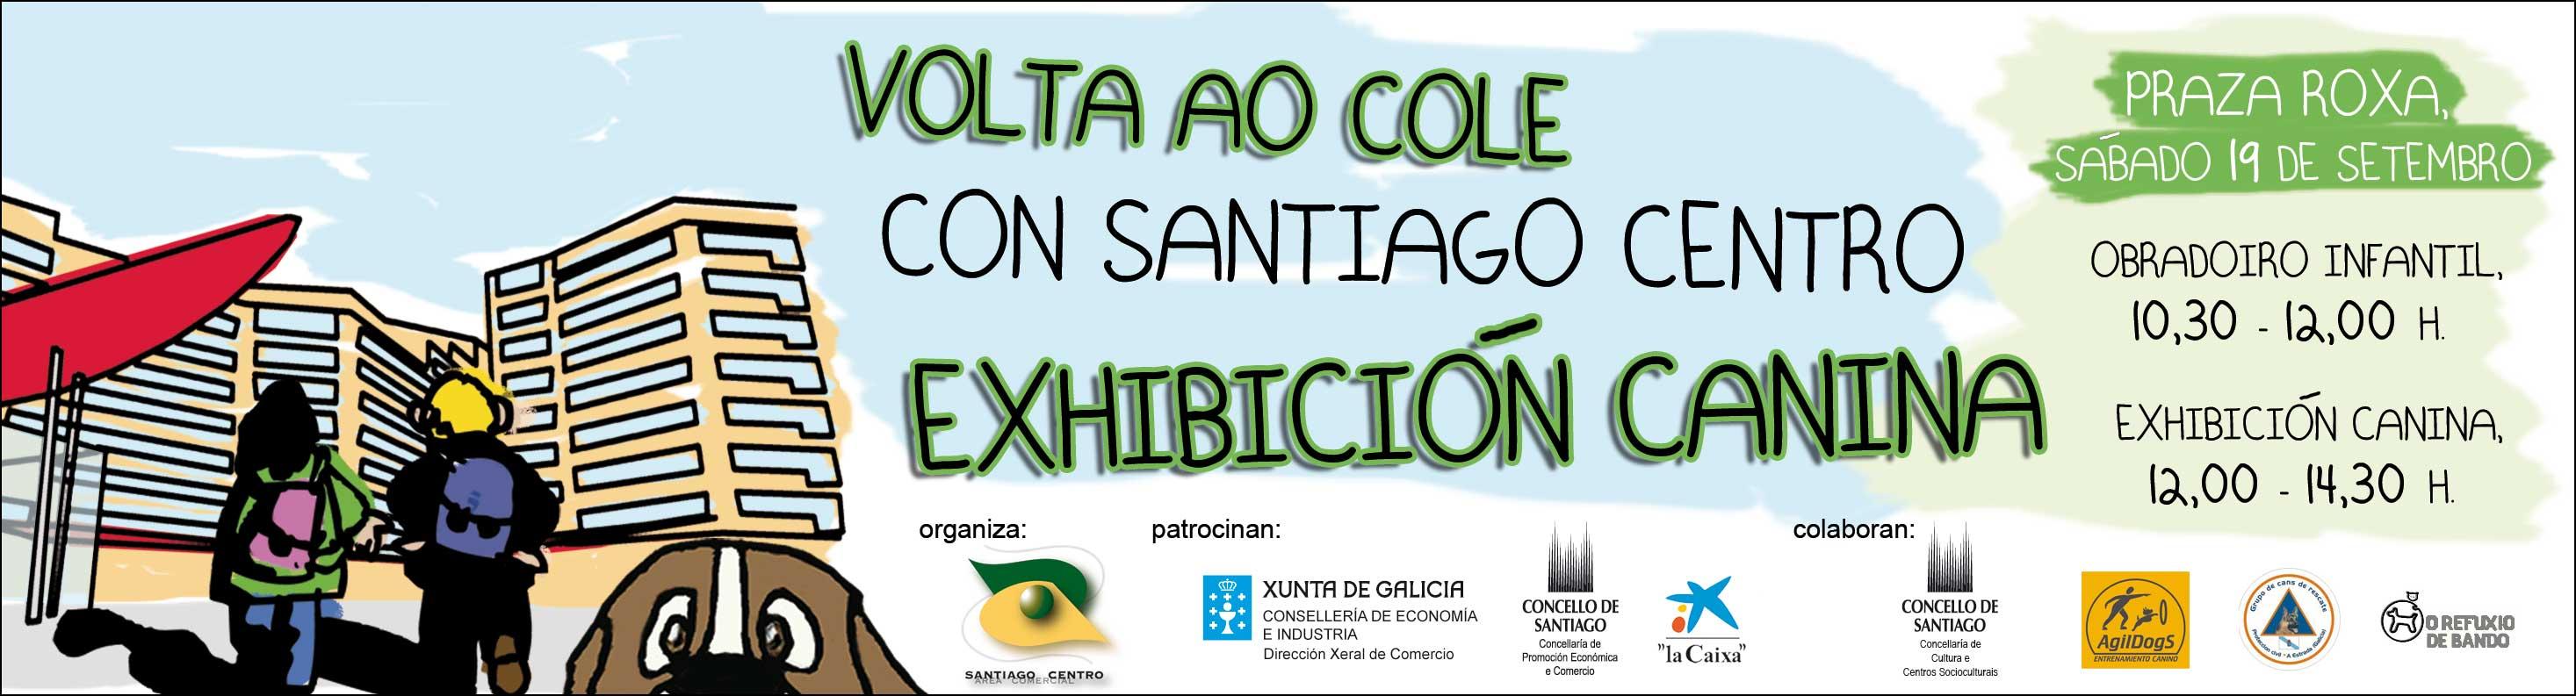 voltaaocole_santiago-centro